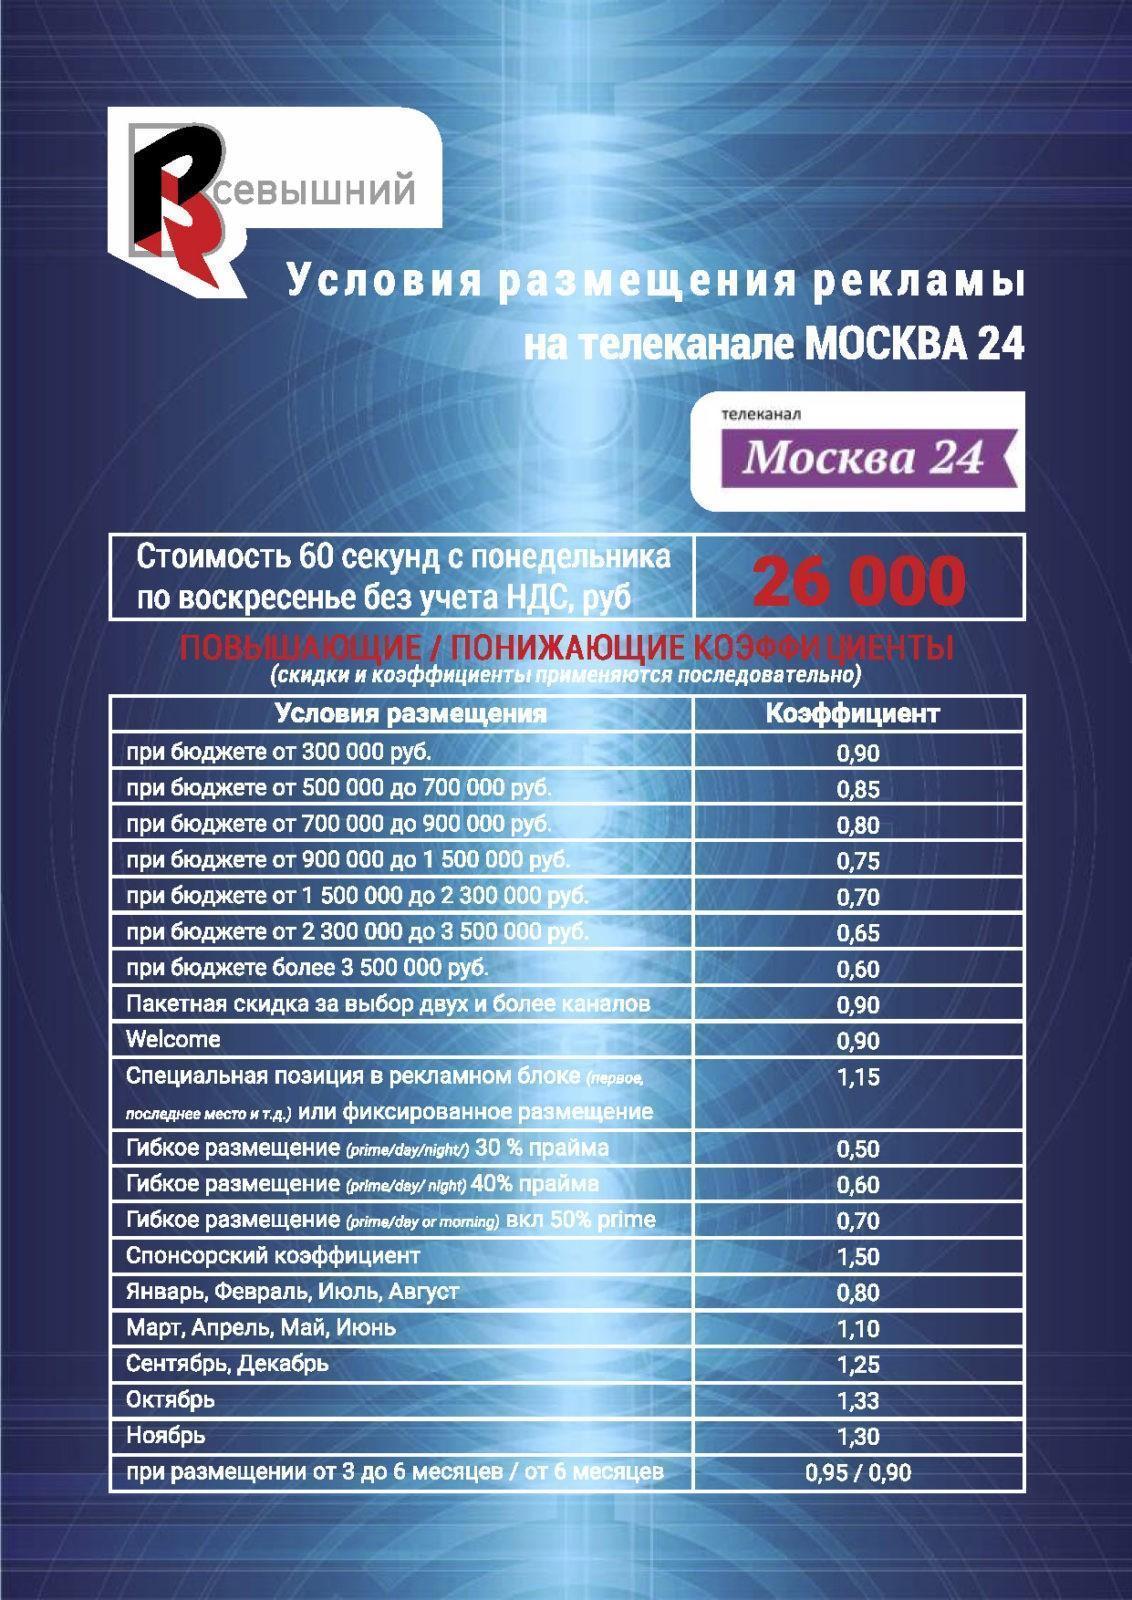 Реклама на телеканале Москва 24